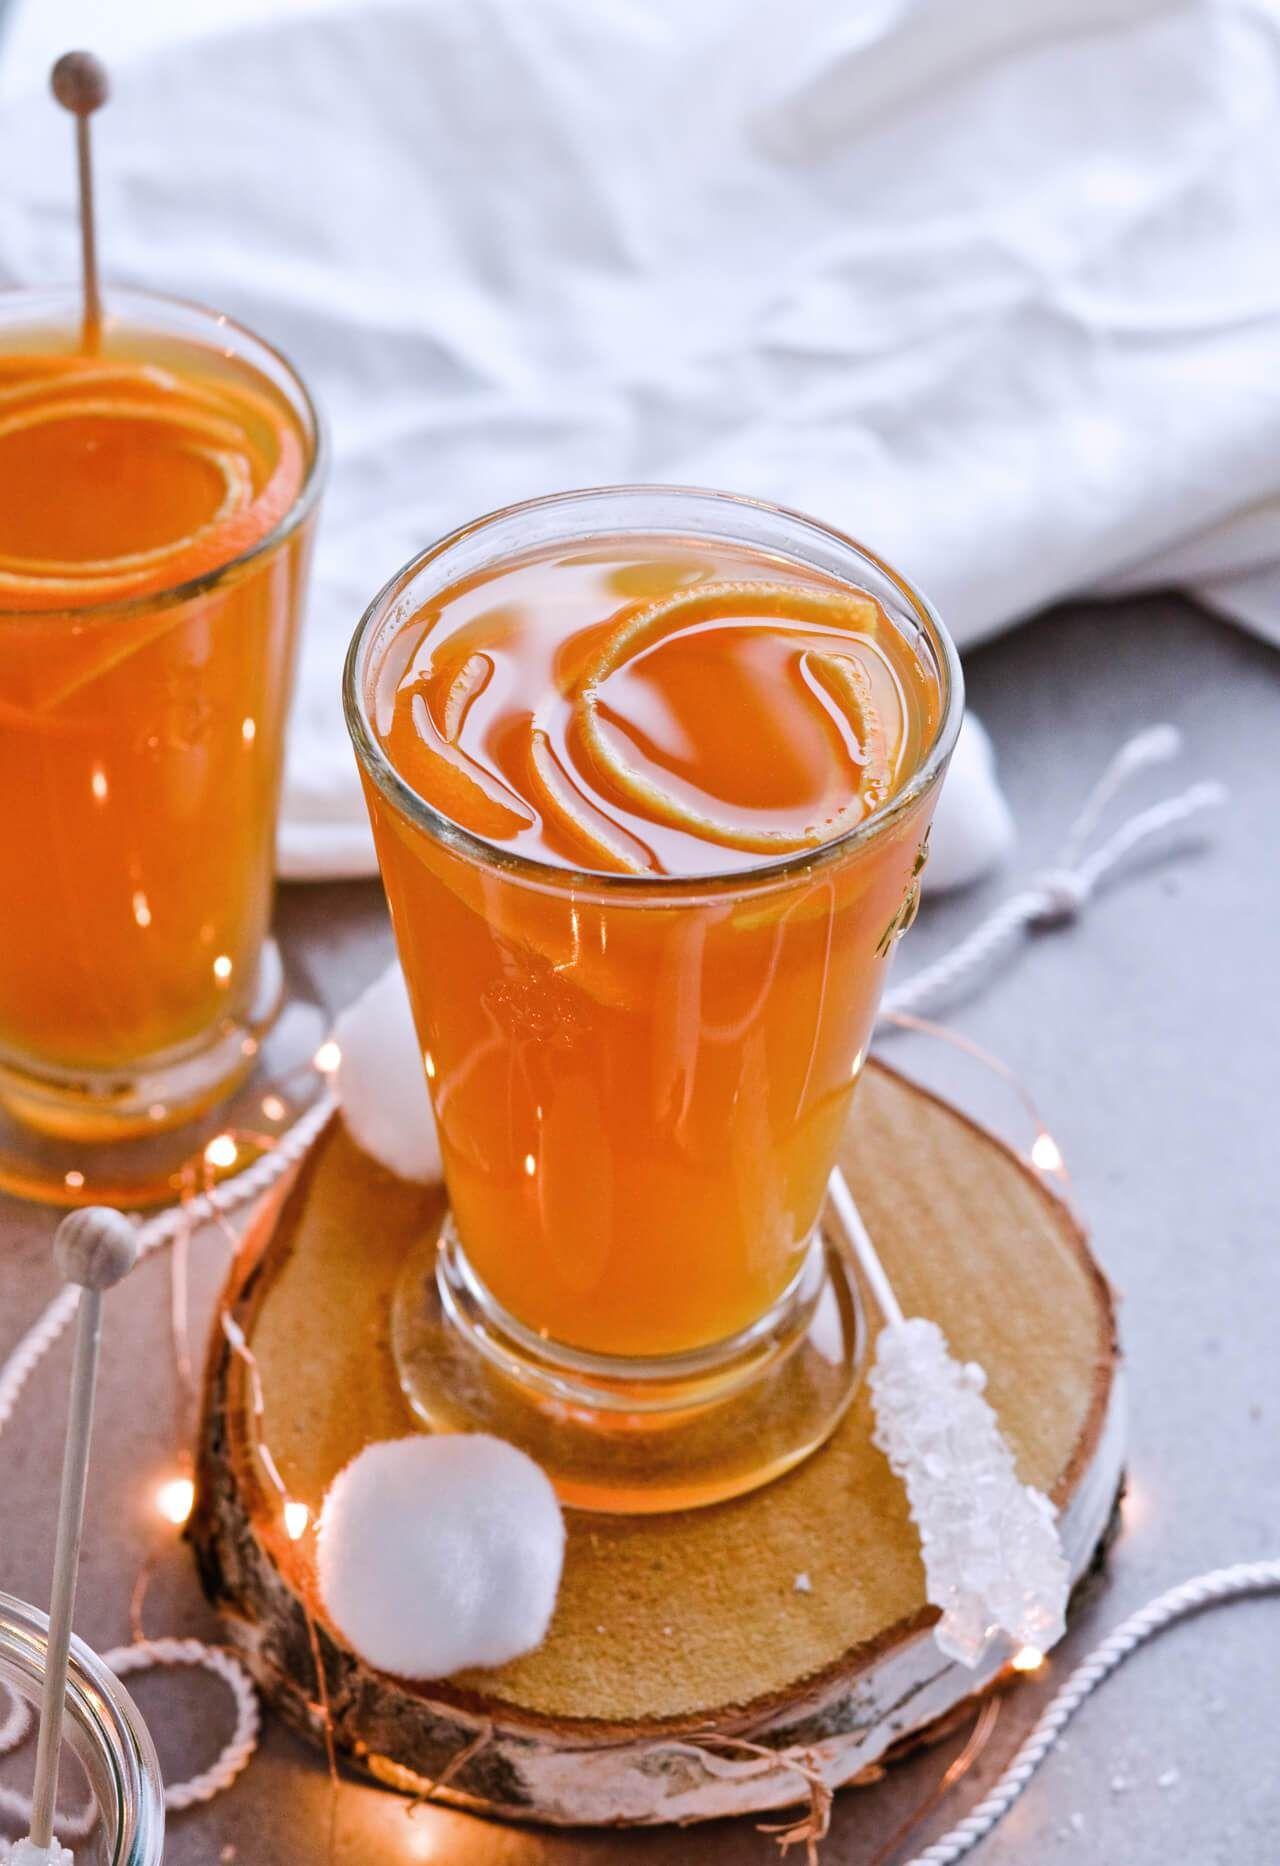 Apple tea with orange and cinnamon: recipe